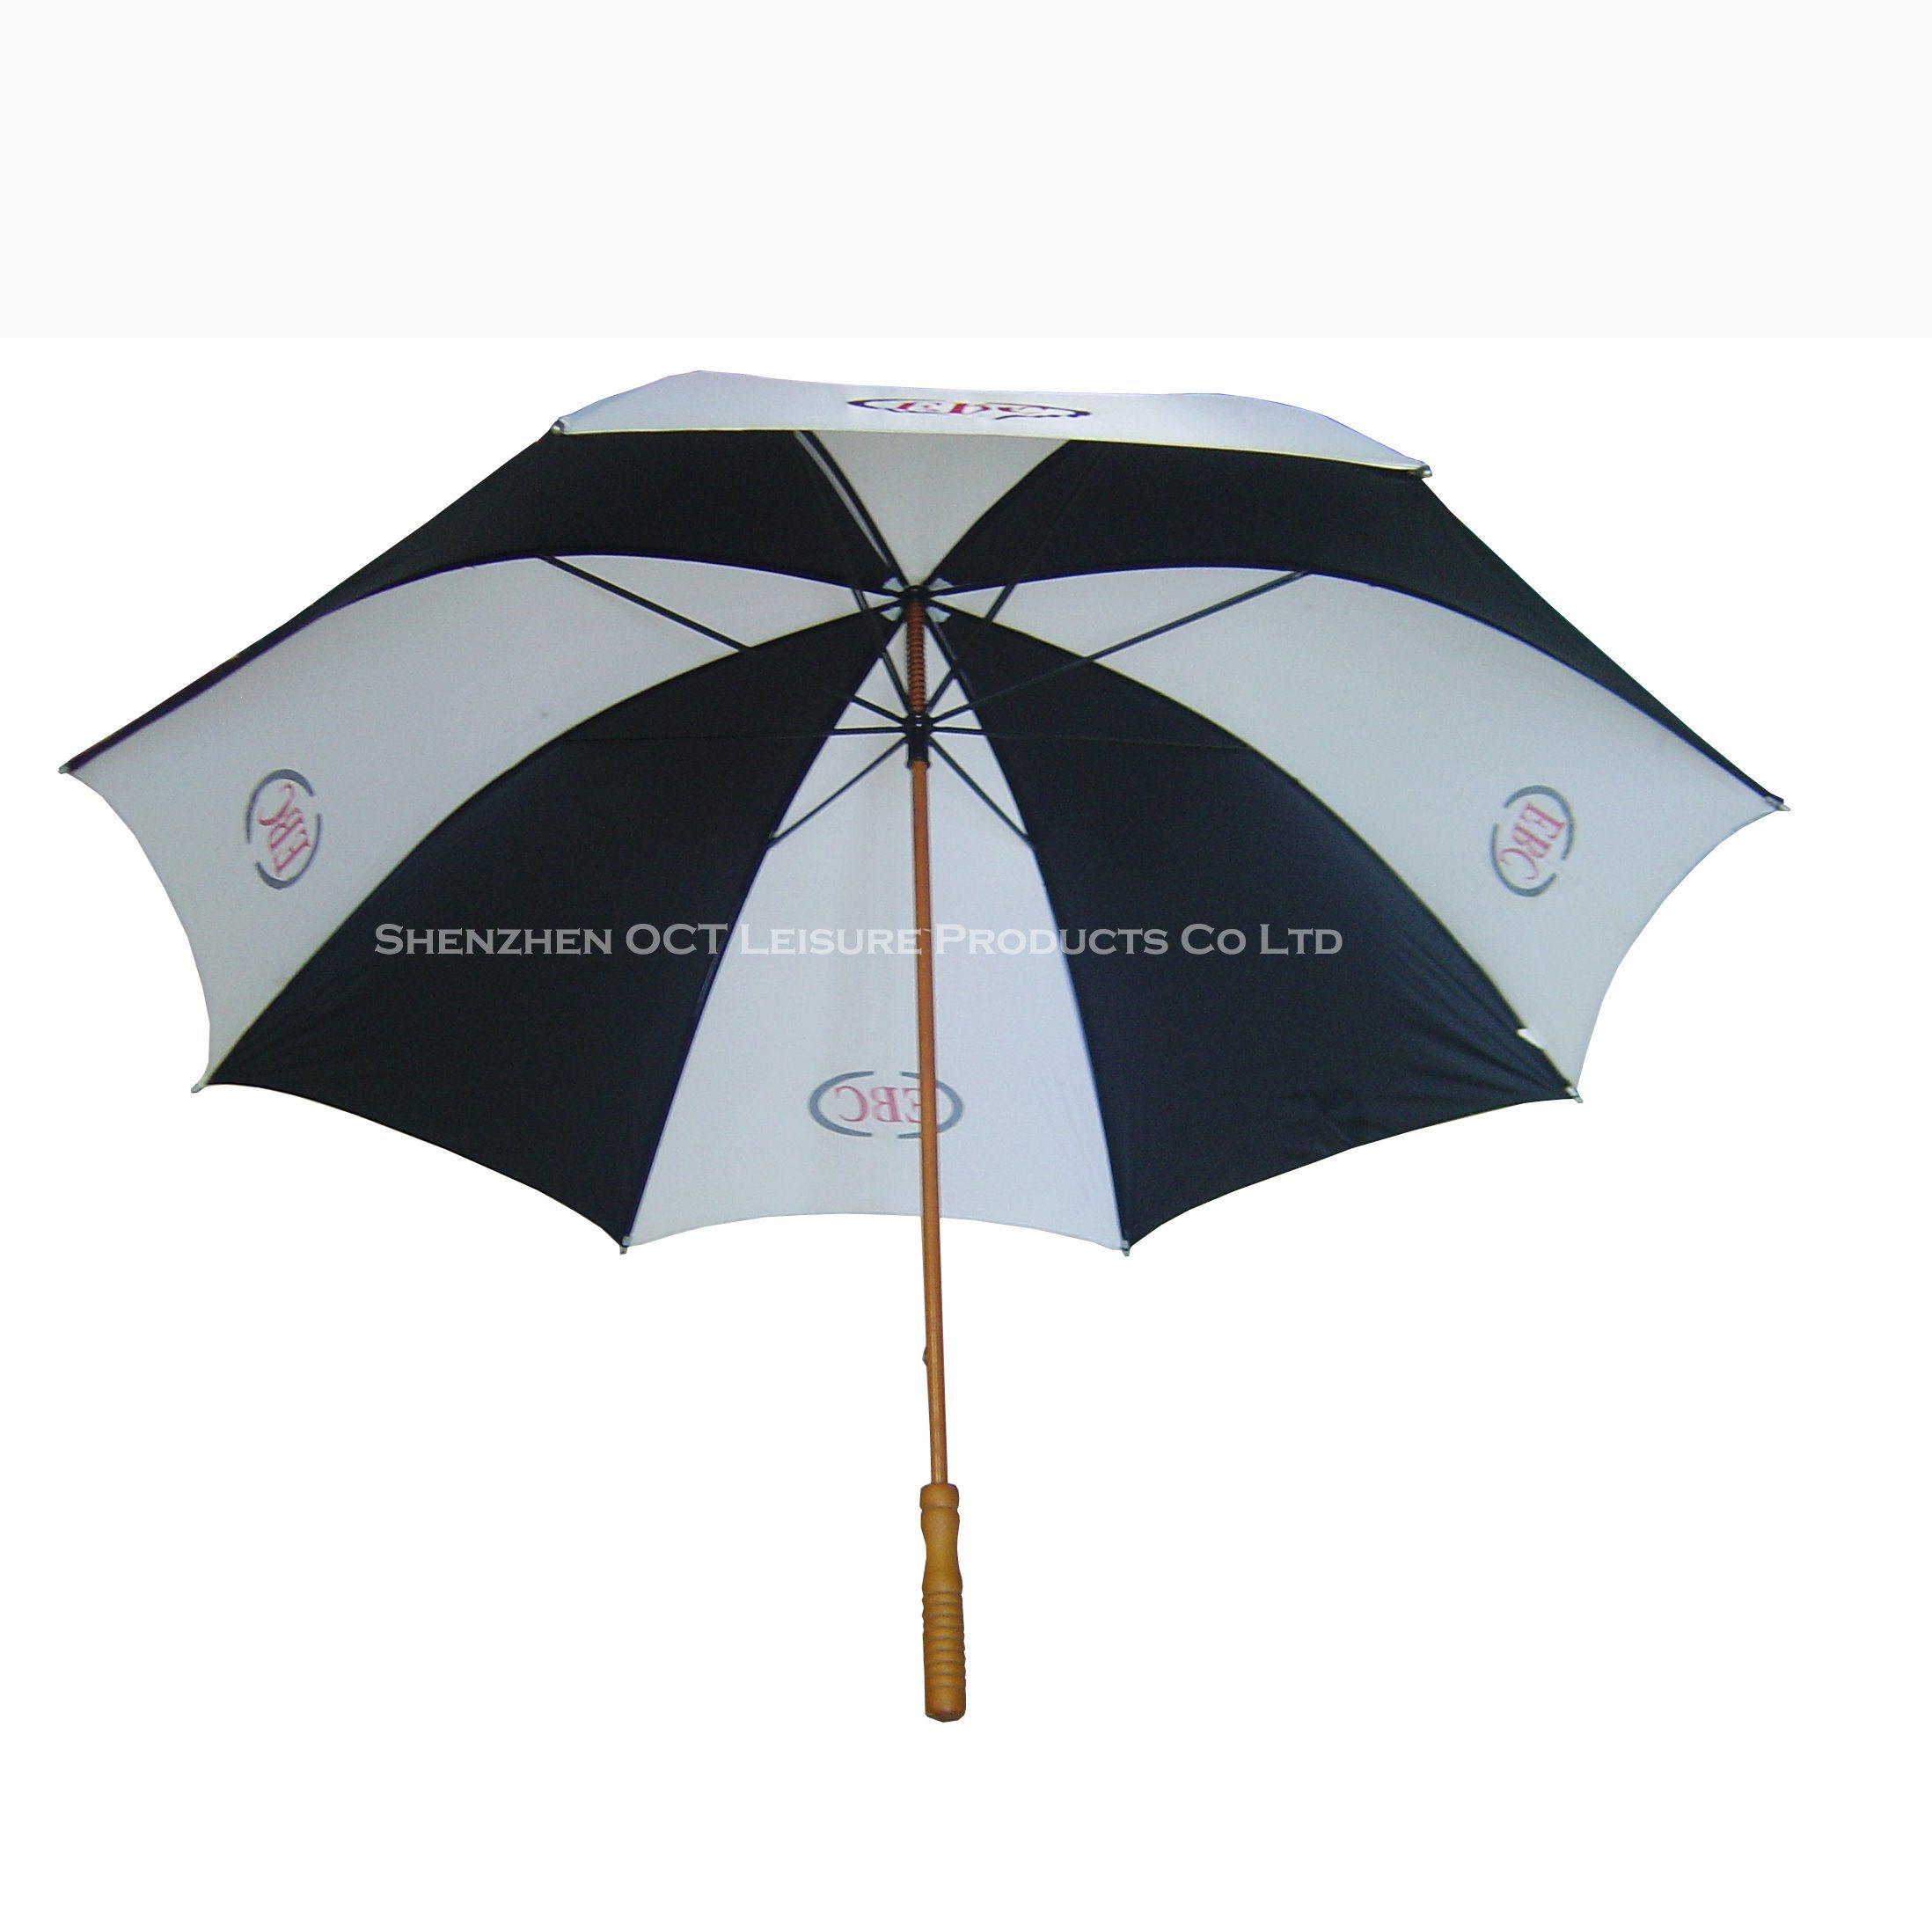 Popular Advertising Golf Umbrella with Good Quality (OCT-G23AD)